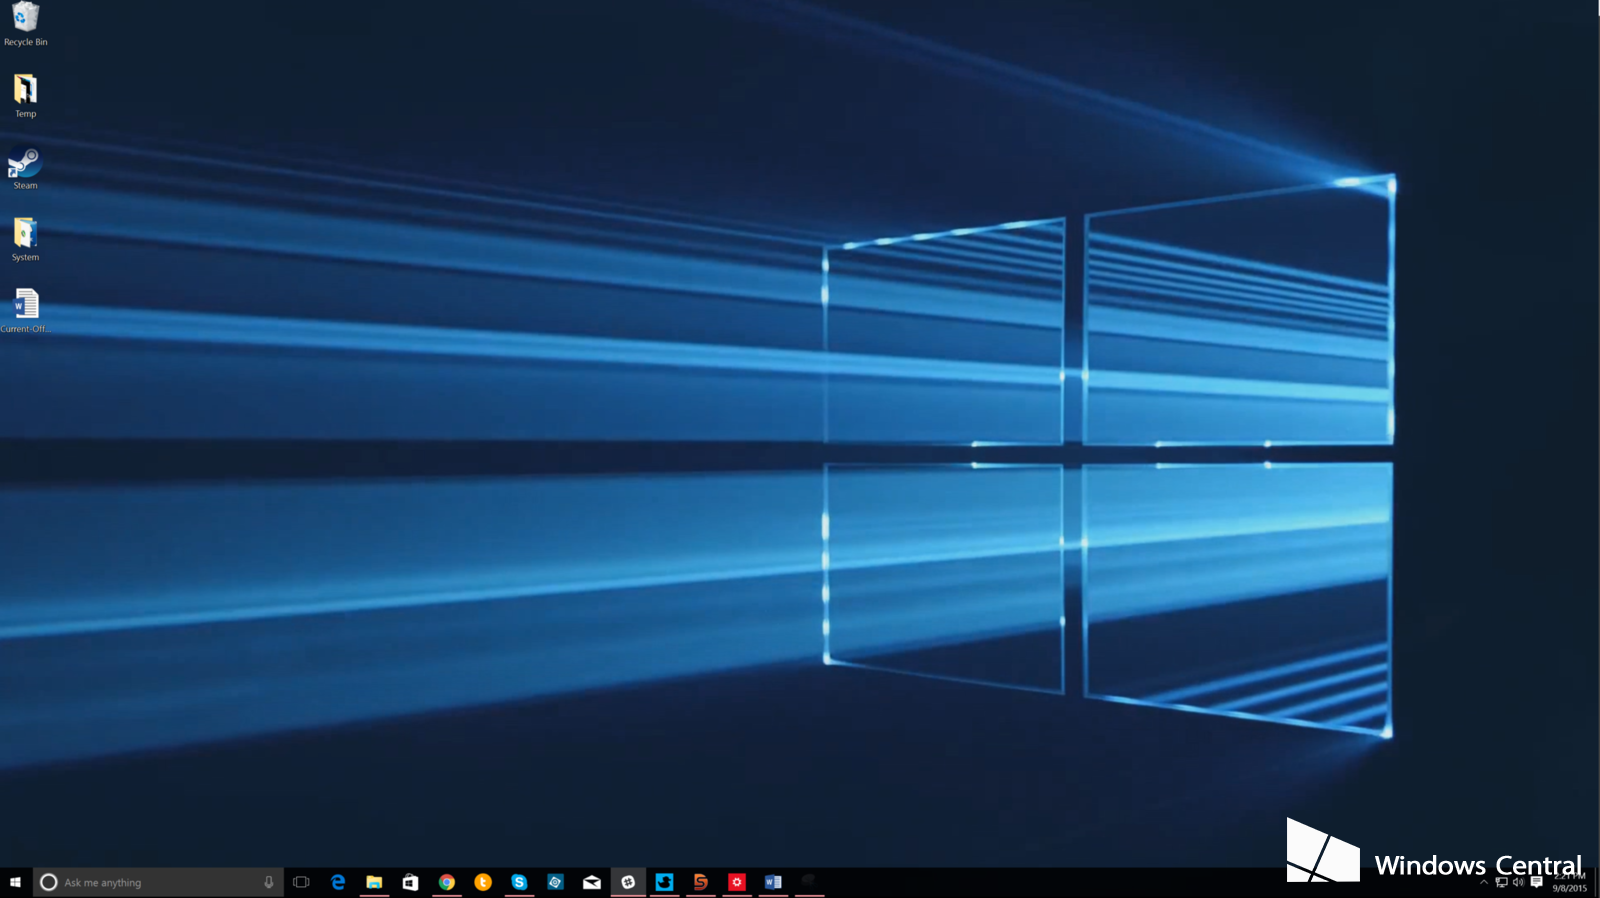 Moving Wallpaper Windows 10 Steam